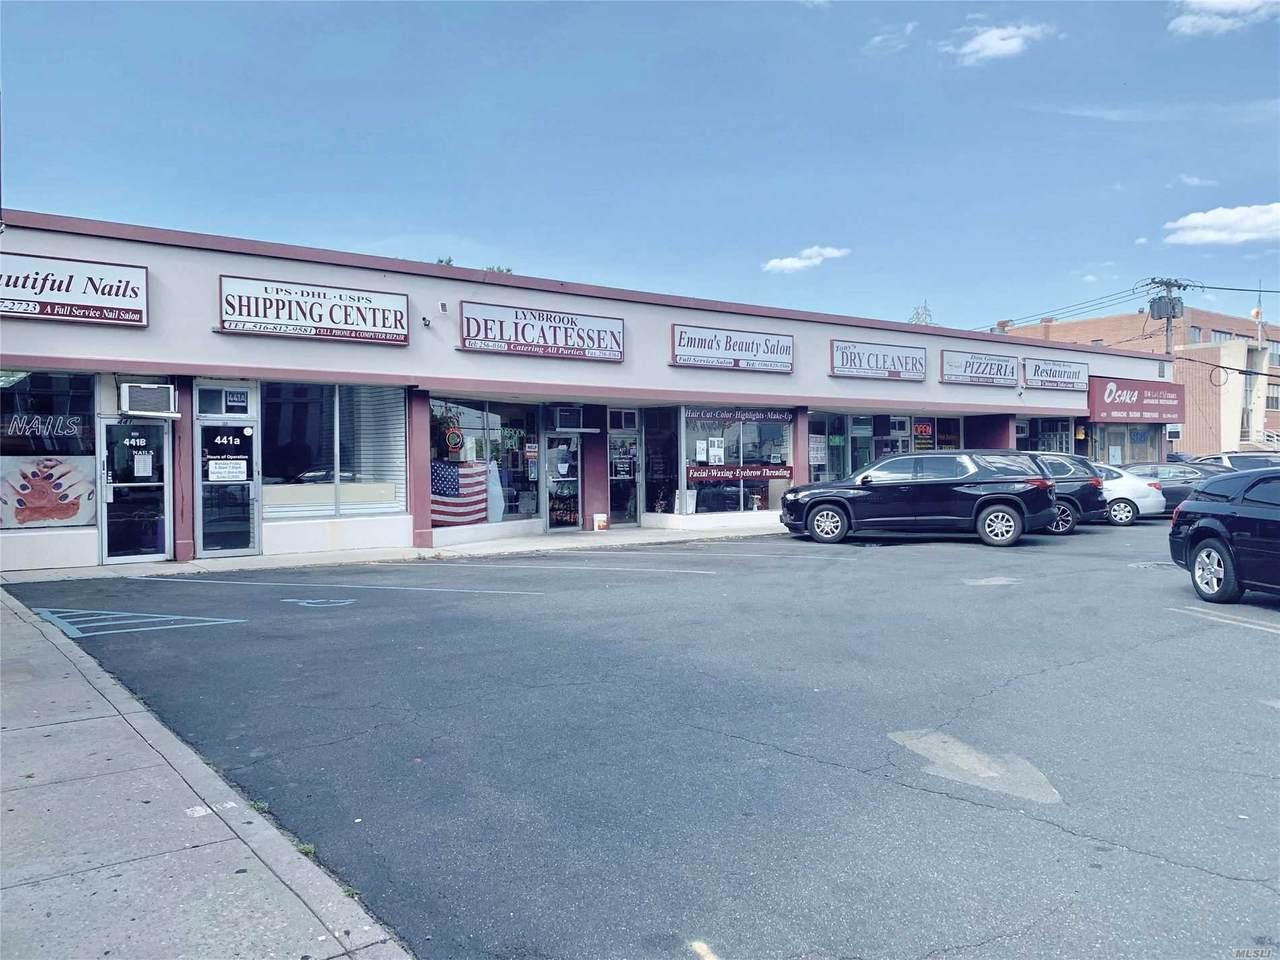 441A Merrick Road - Photo 1